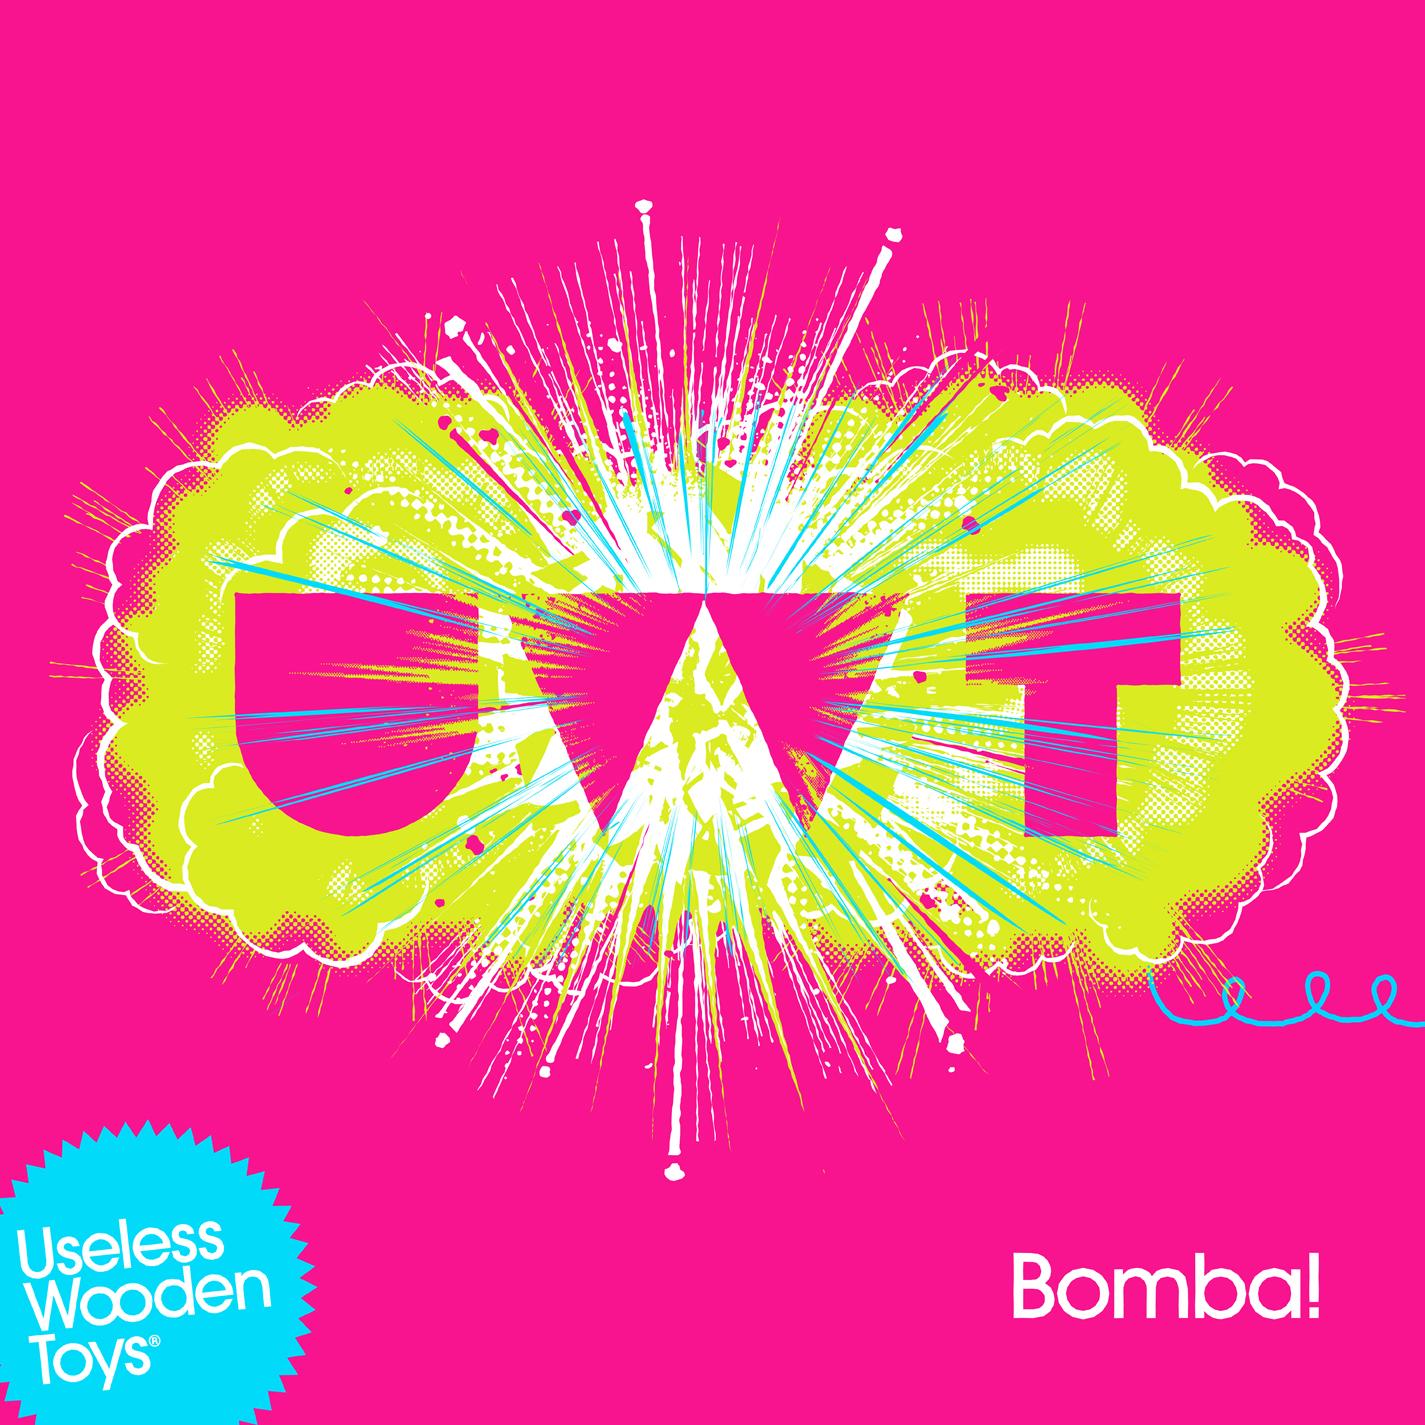 DV008 / Useless Wooden Toys ft. Mistaman - Bomba!